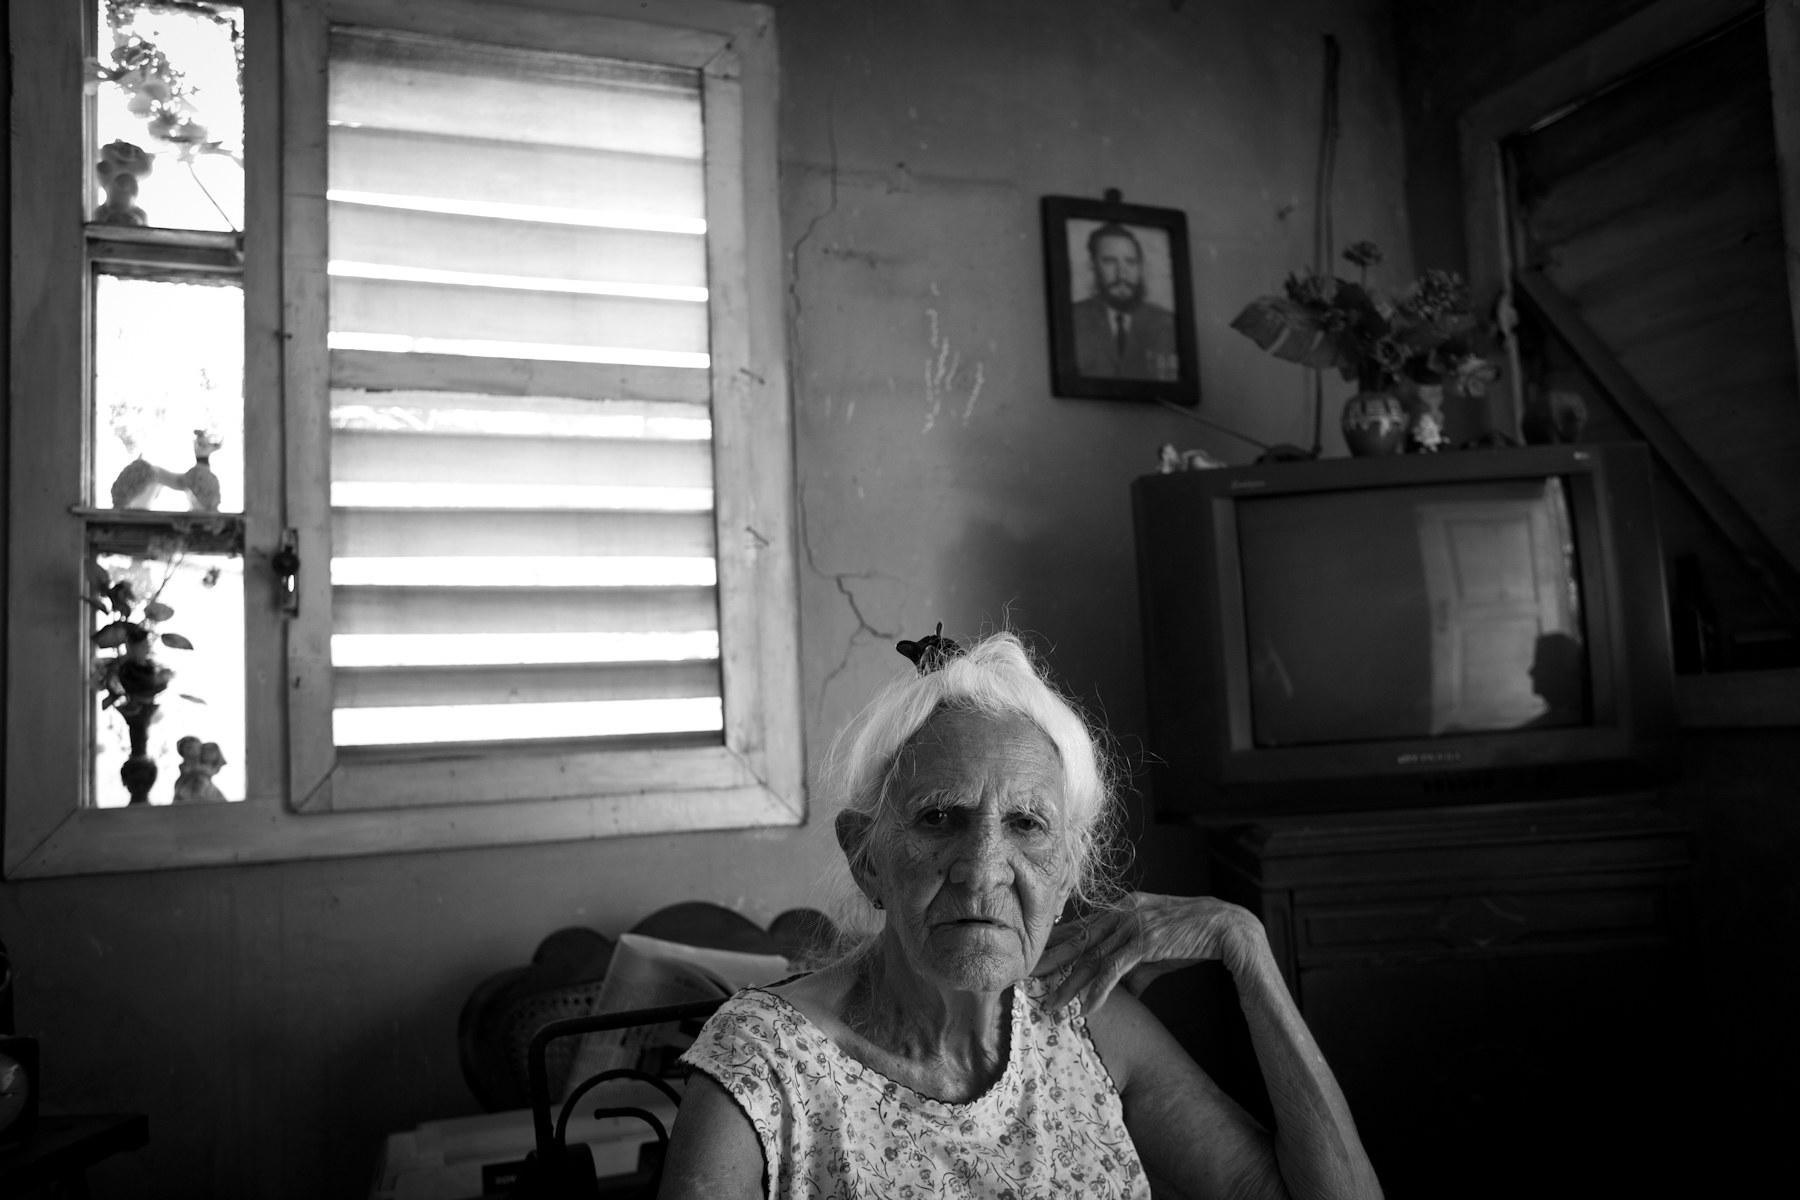 Portfolio_Cuba_Poole_2014_004.JPG